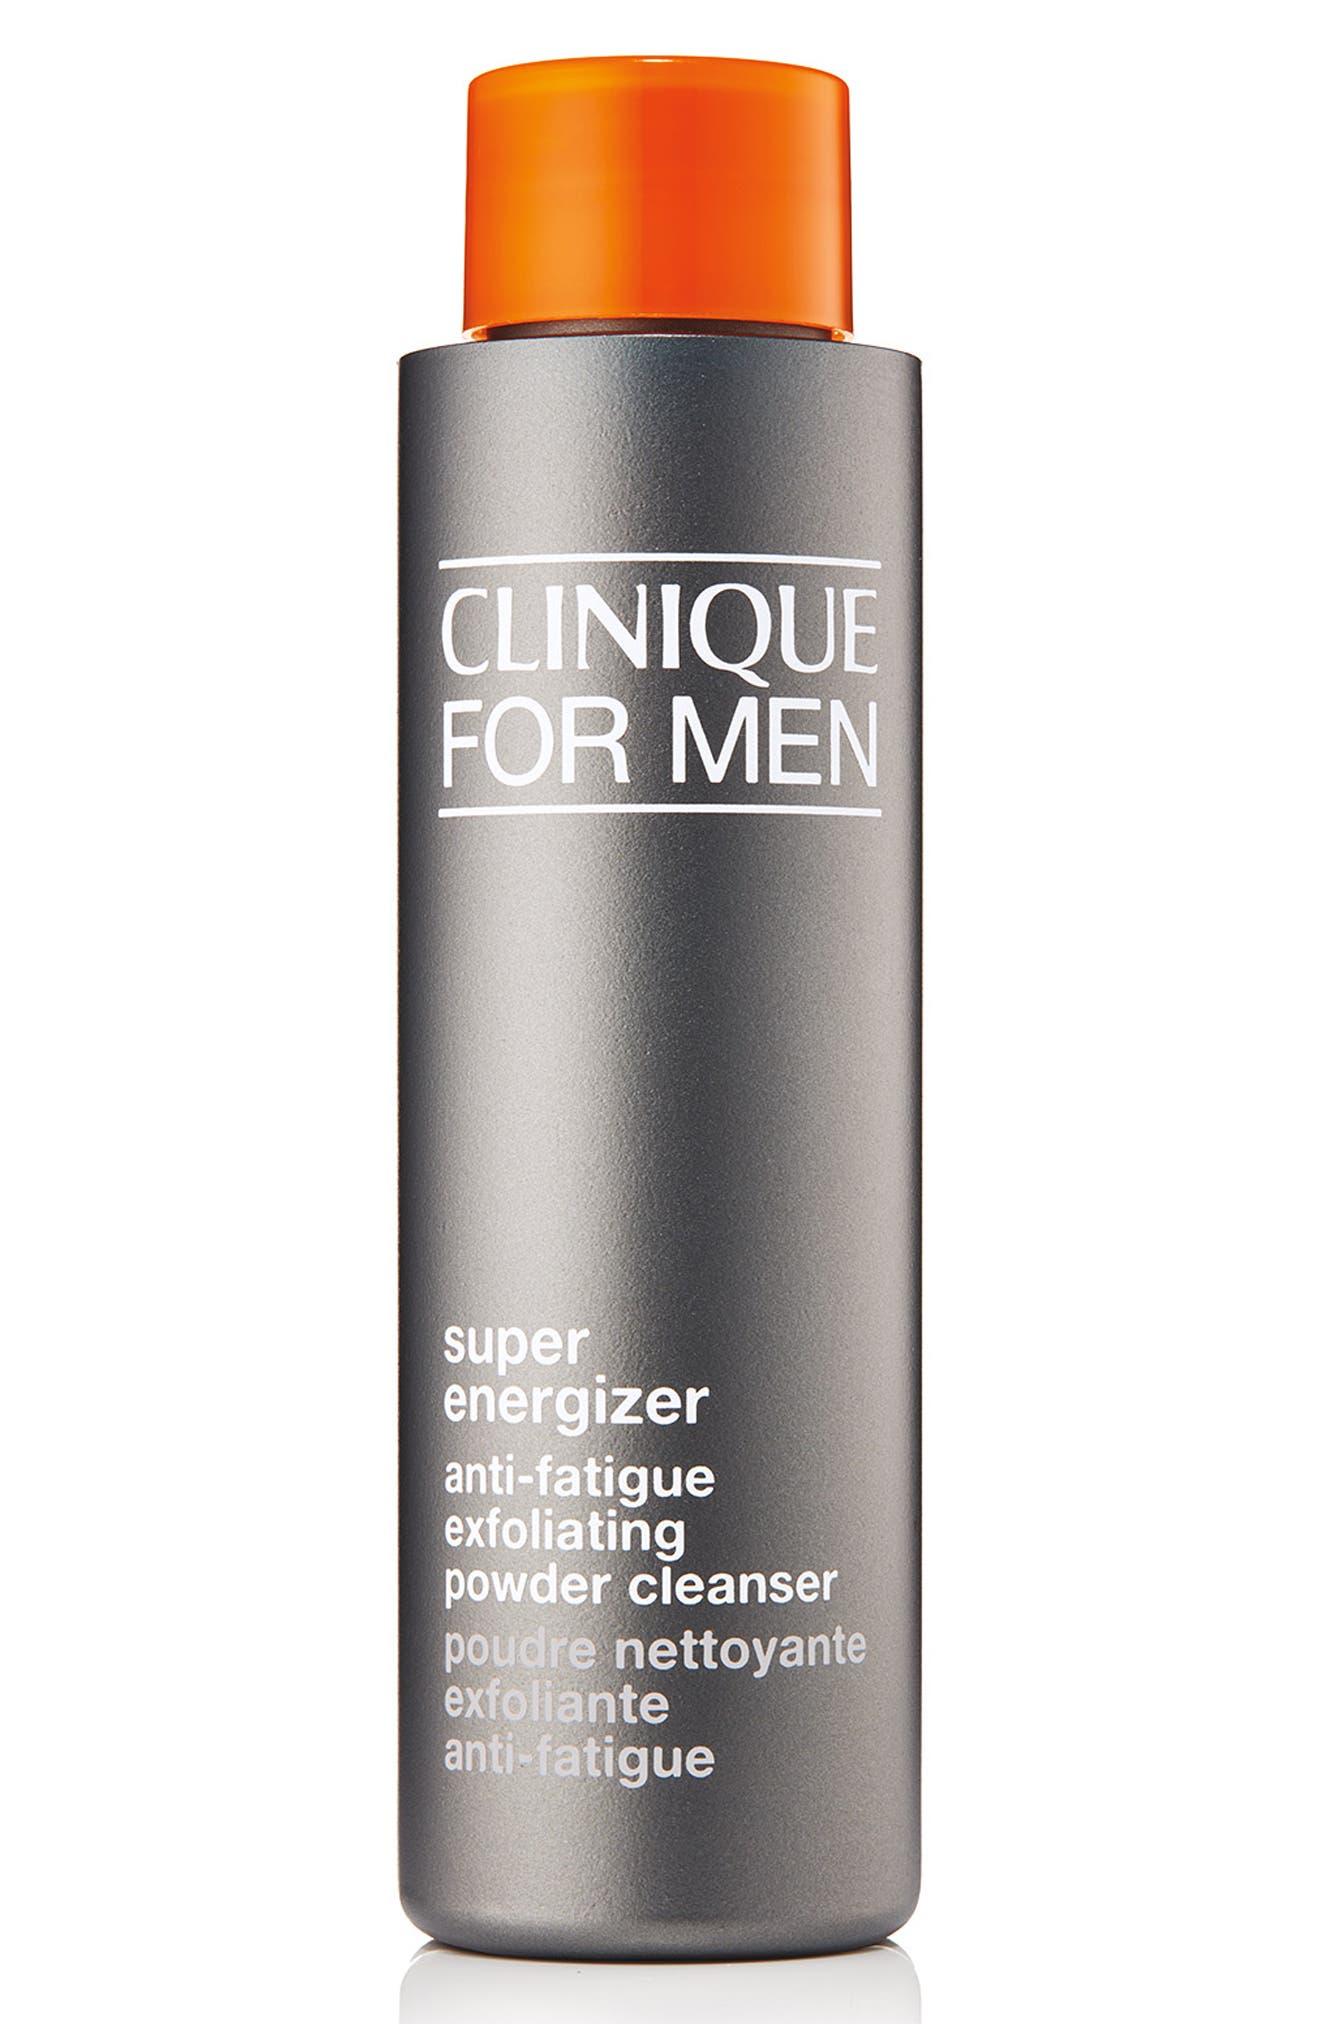 CLINIQUE for Men Super Energizer Anti-Fatigue Exfoliating Powder Cleanser, Main, color, NO COLOR